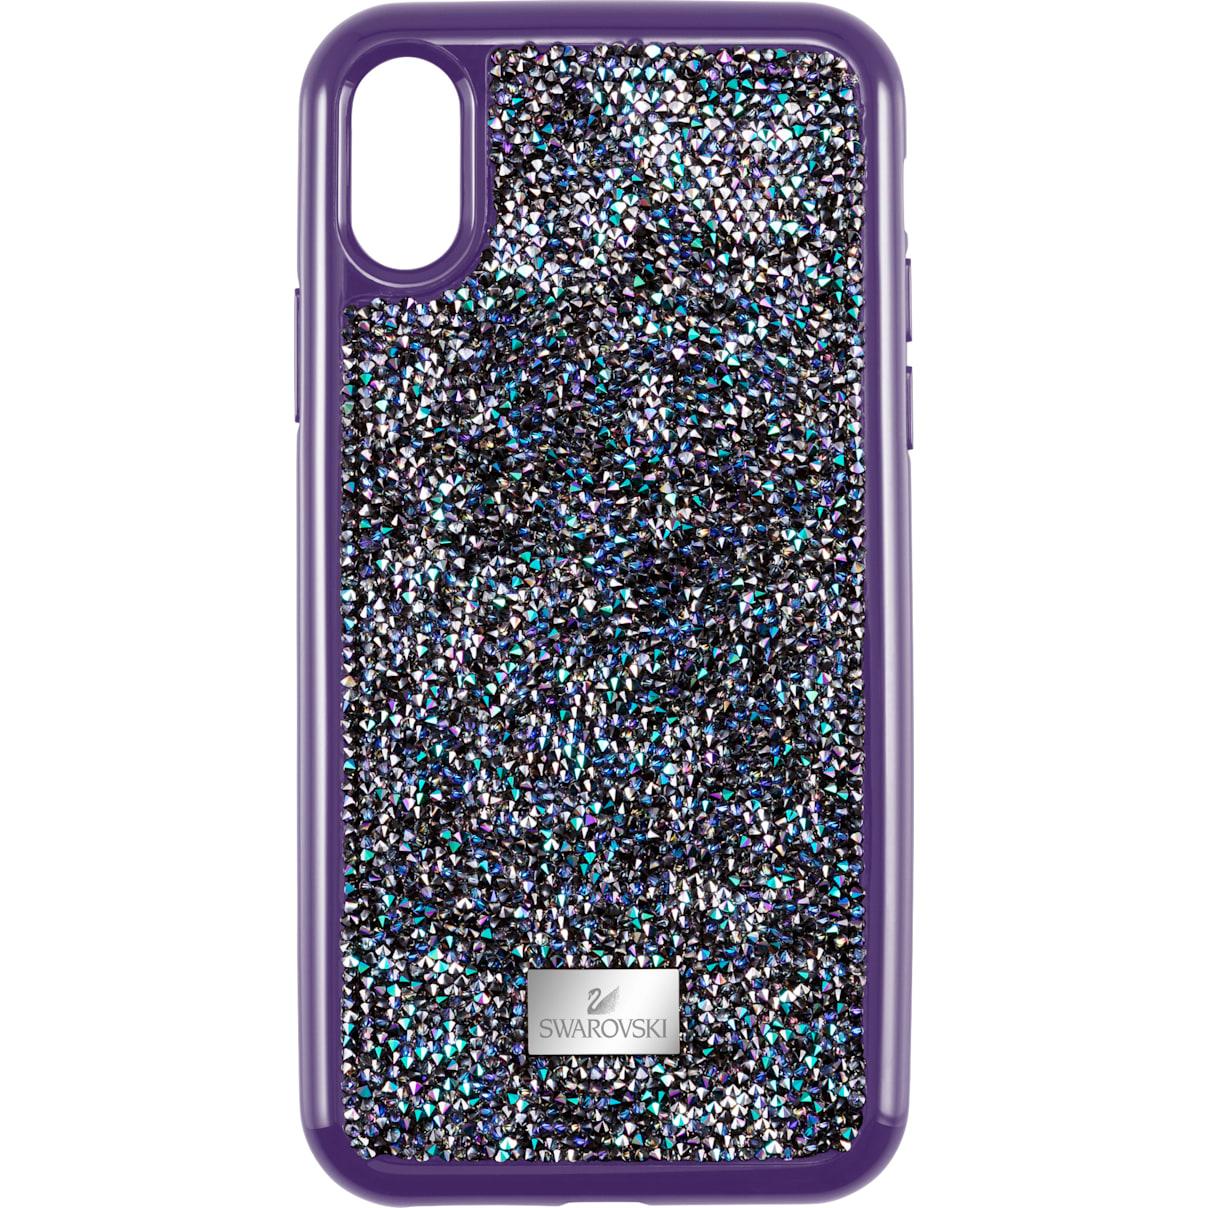 Swarovski Glam Rock Smartphone case with Bumper, iPhone® XS Max, Purple